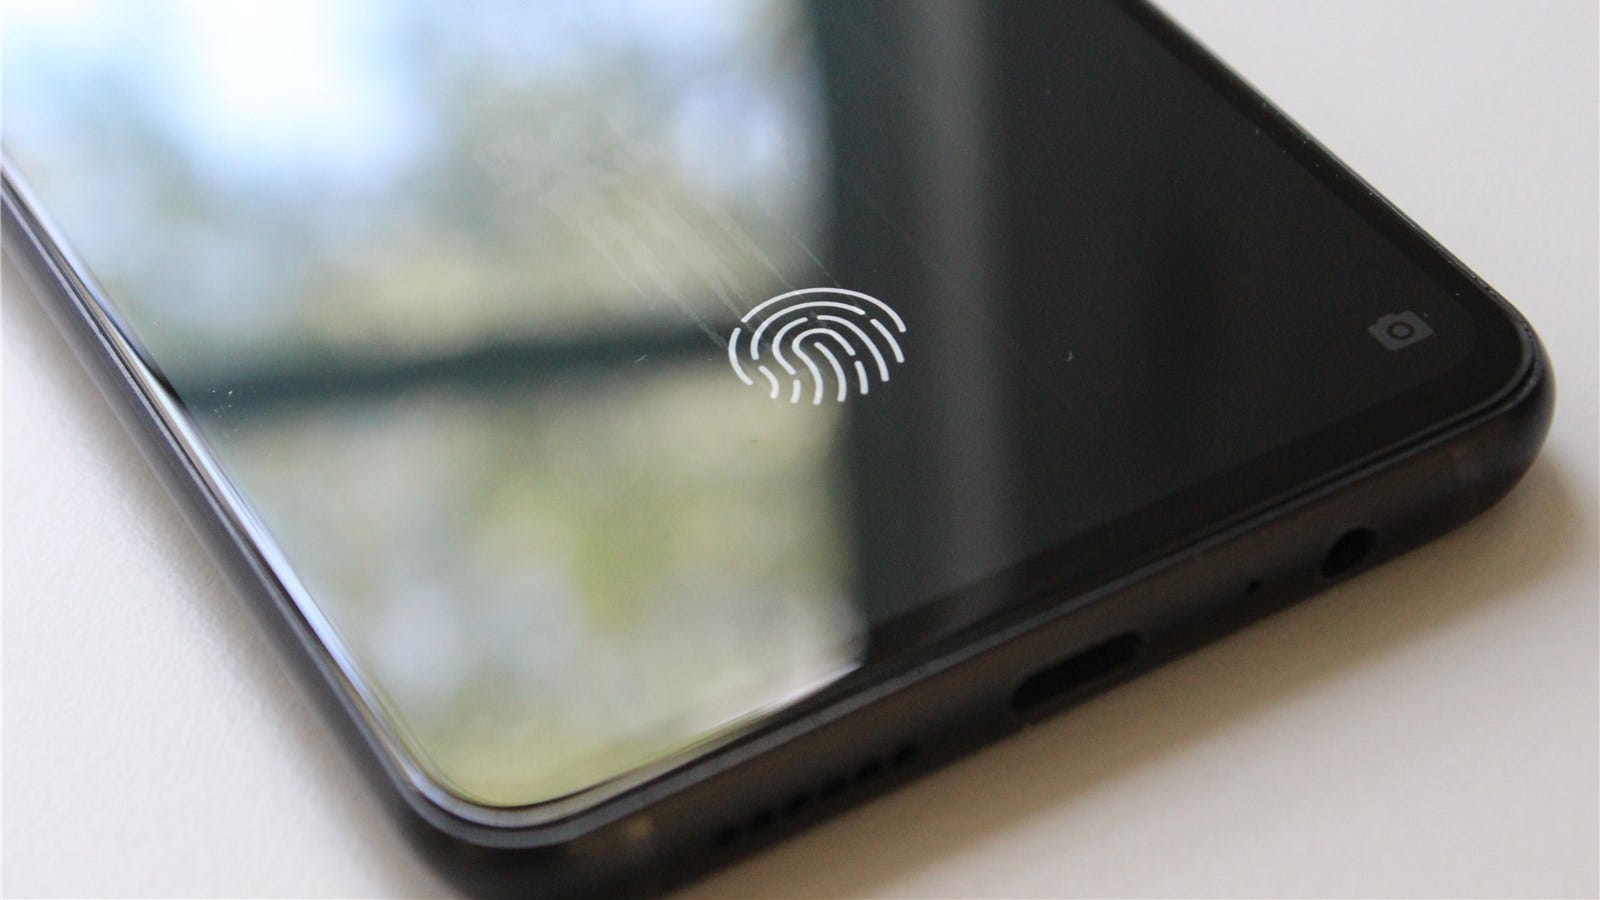 The BOLD N1's in-display fingerprint reader